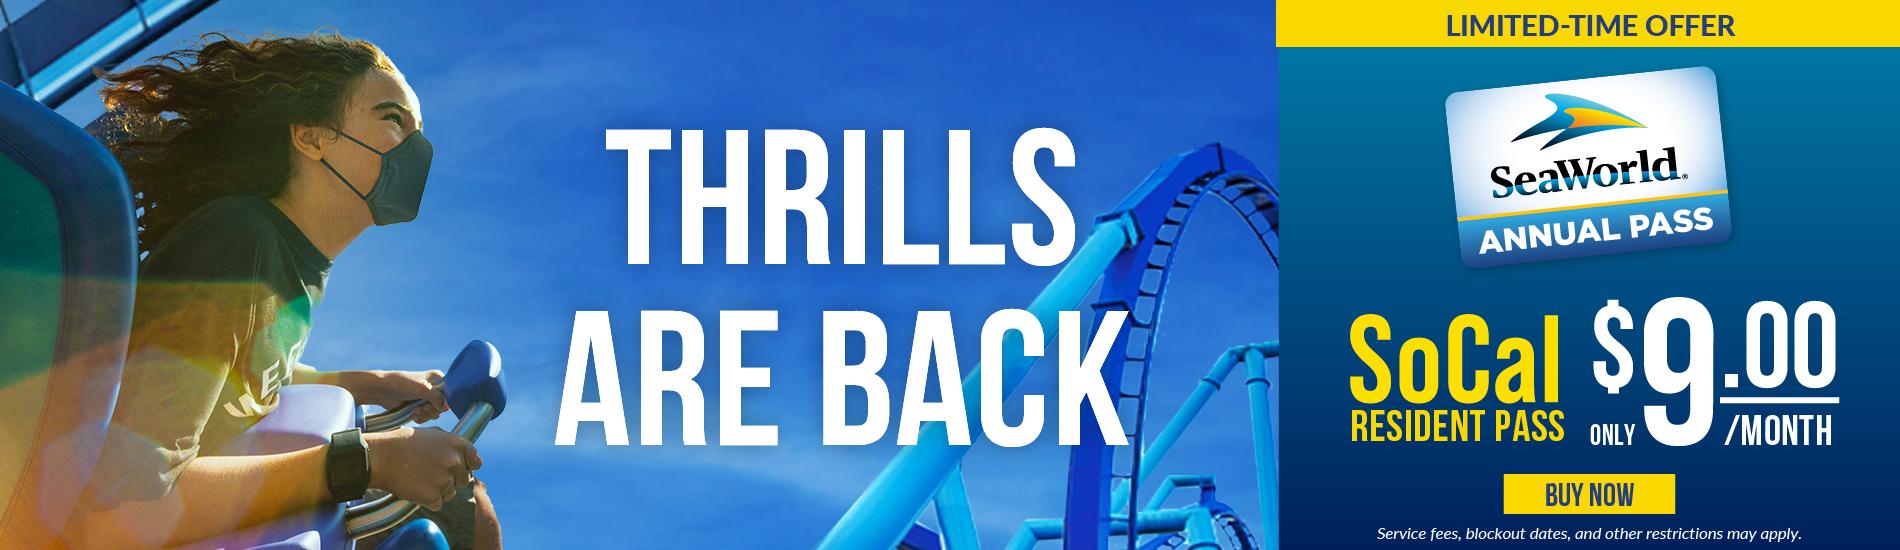 Thrills are Back